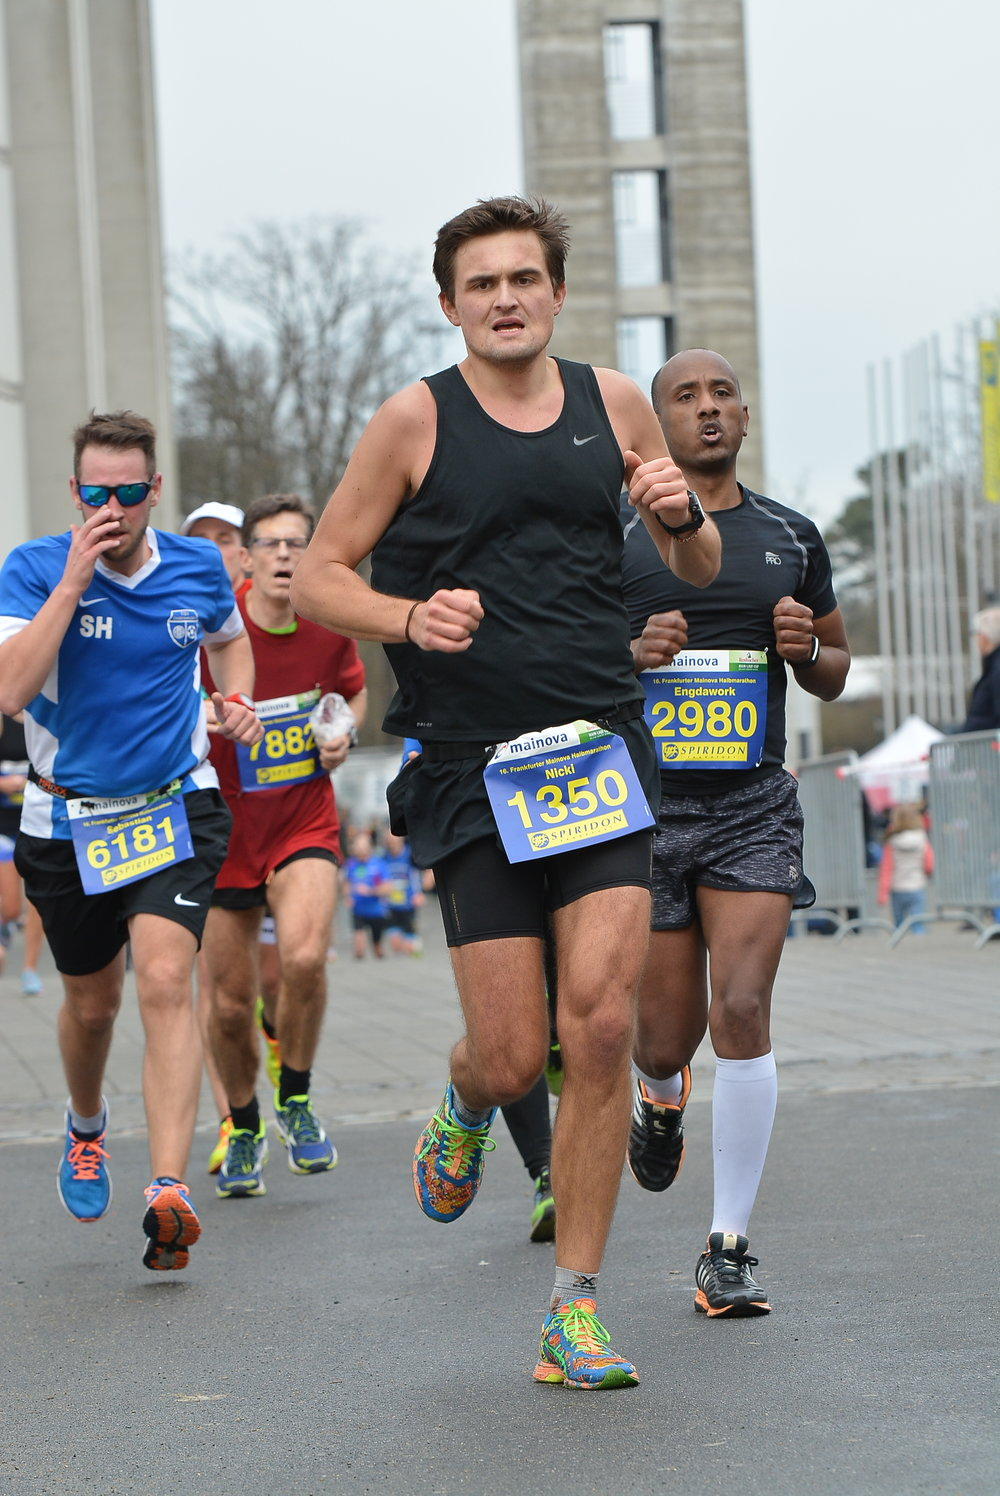 Nicki-Lange-Frankfurt-Half-Marathon-2018-4.jpg